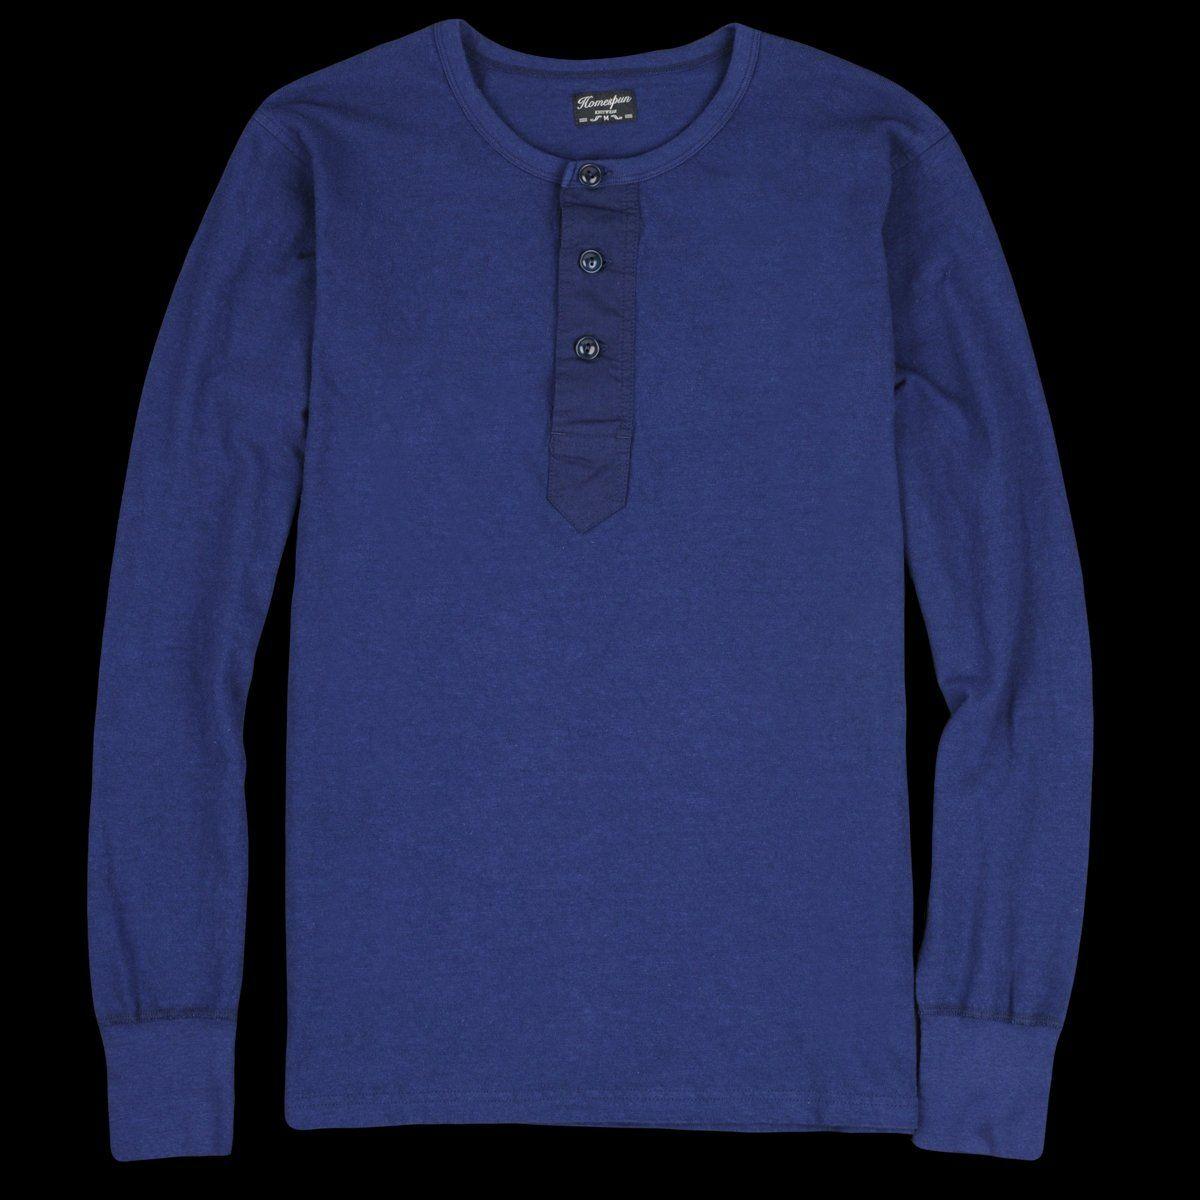 Homespun Knitwear Zimbabwe Jersey Surplus Henley In Indigo Henley Long Sleeve Tshirt Men Mens Tops